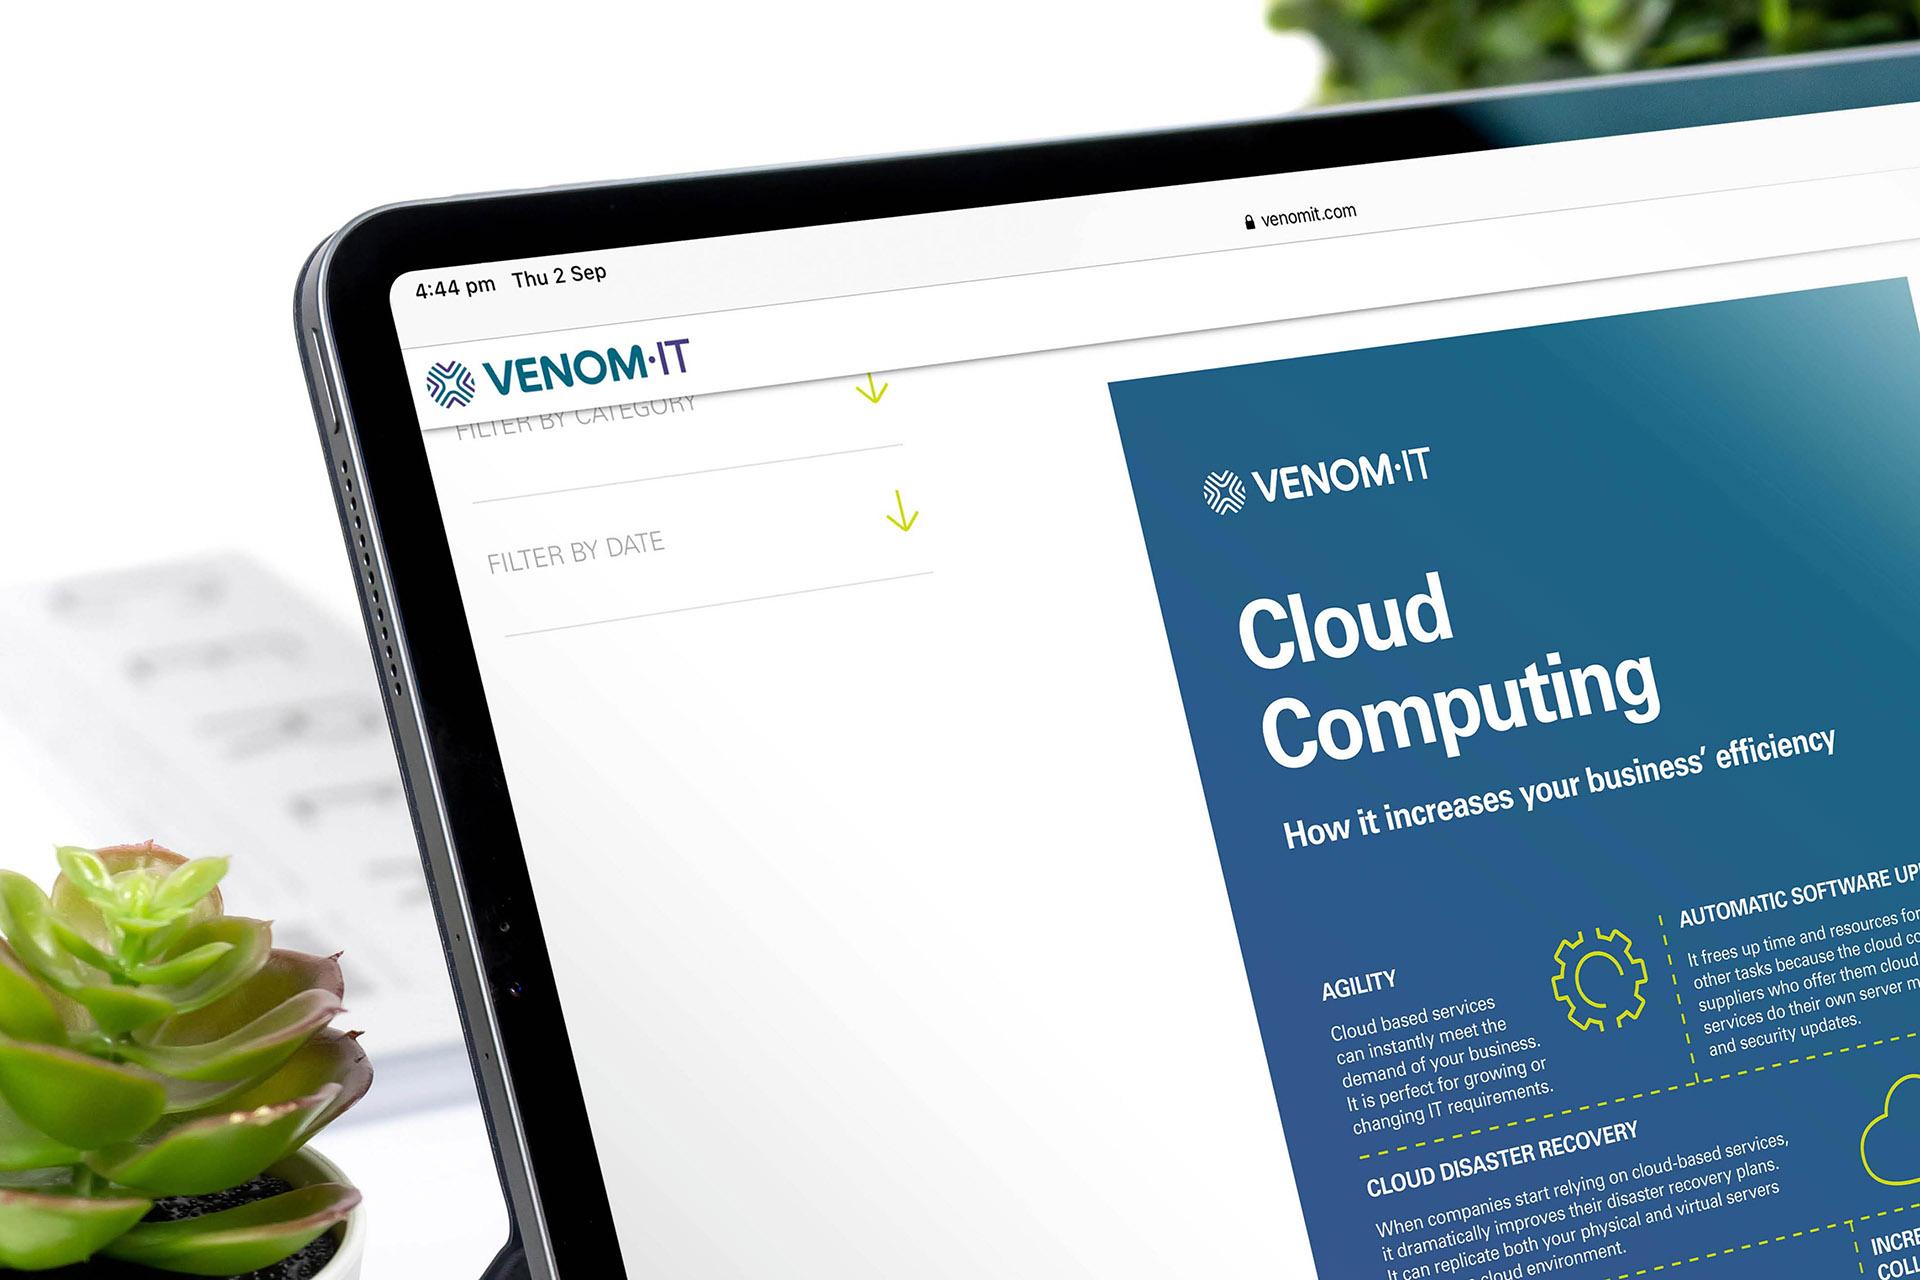 https://venomit.com/wp-content/uploads/2021/09/the-business-case-for-cloud-computing.jpg